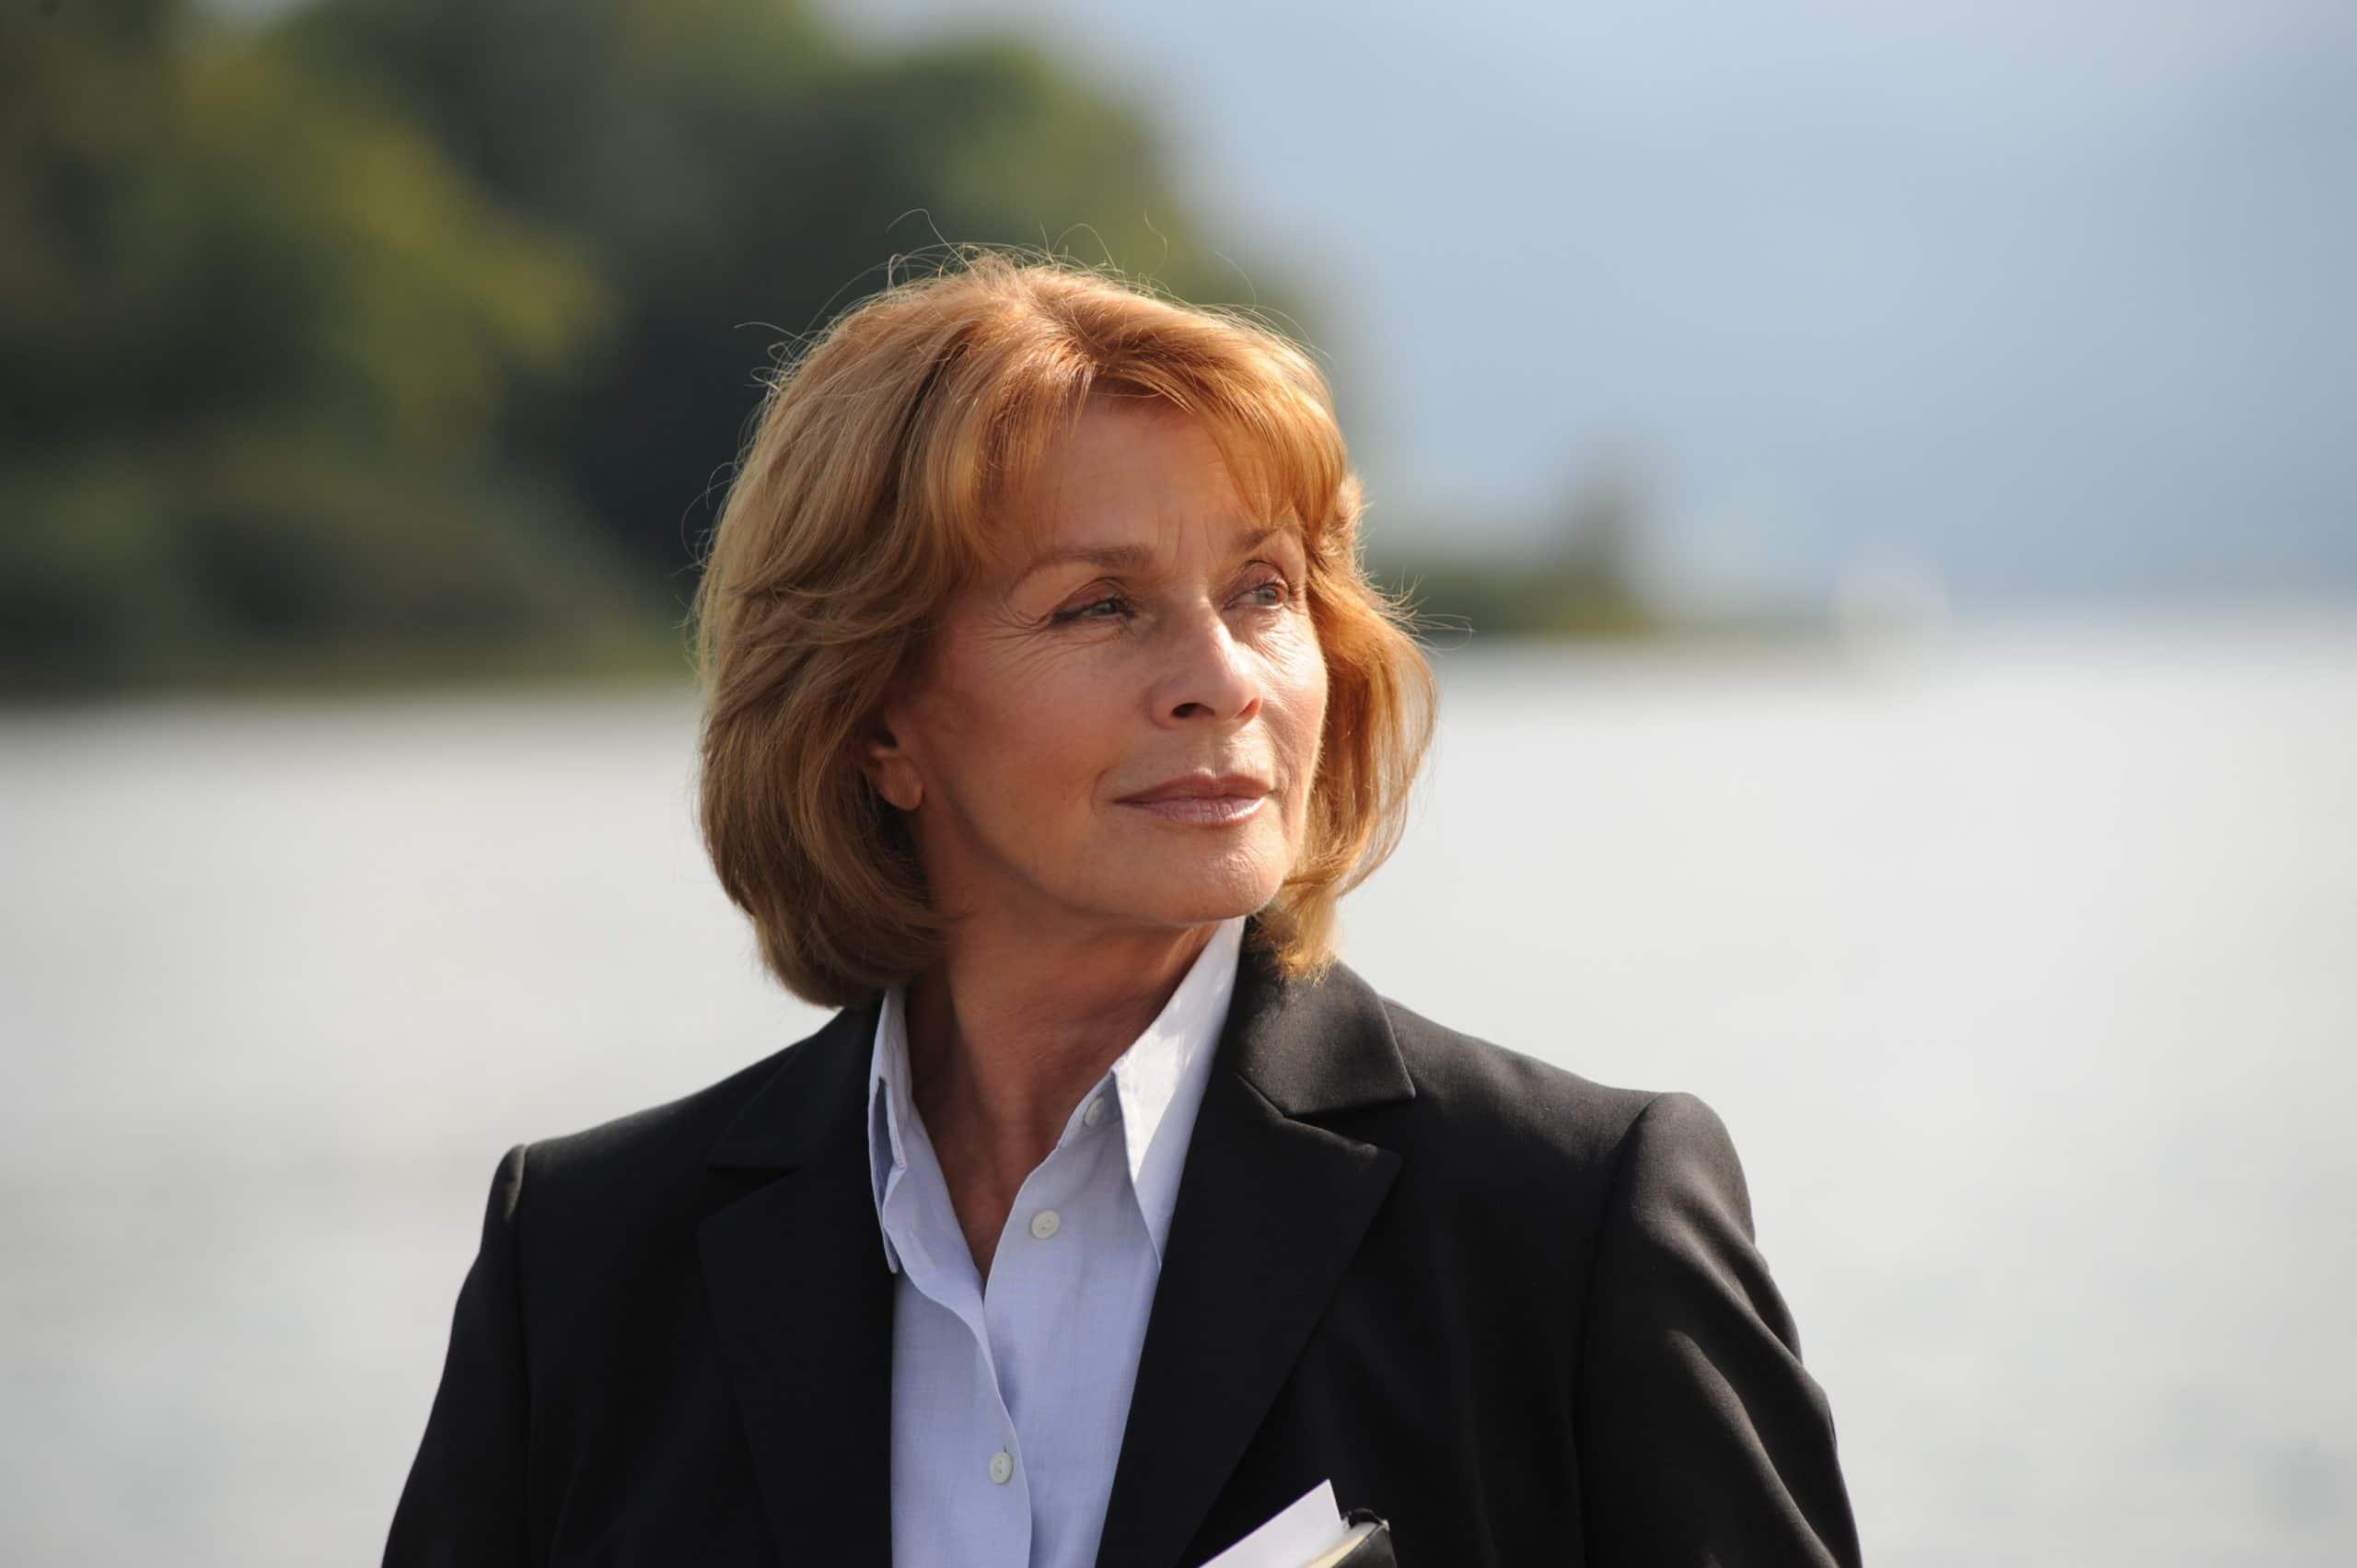 Senta Berger in Unter Verdacht